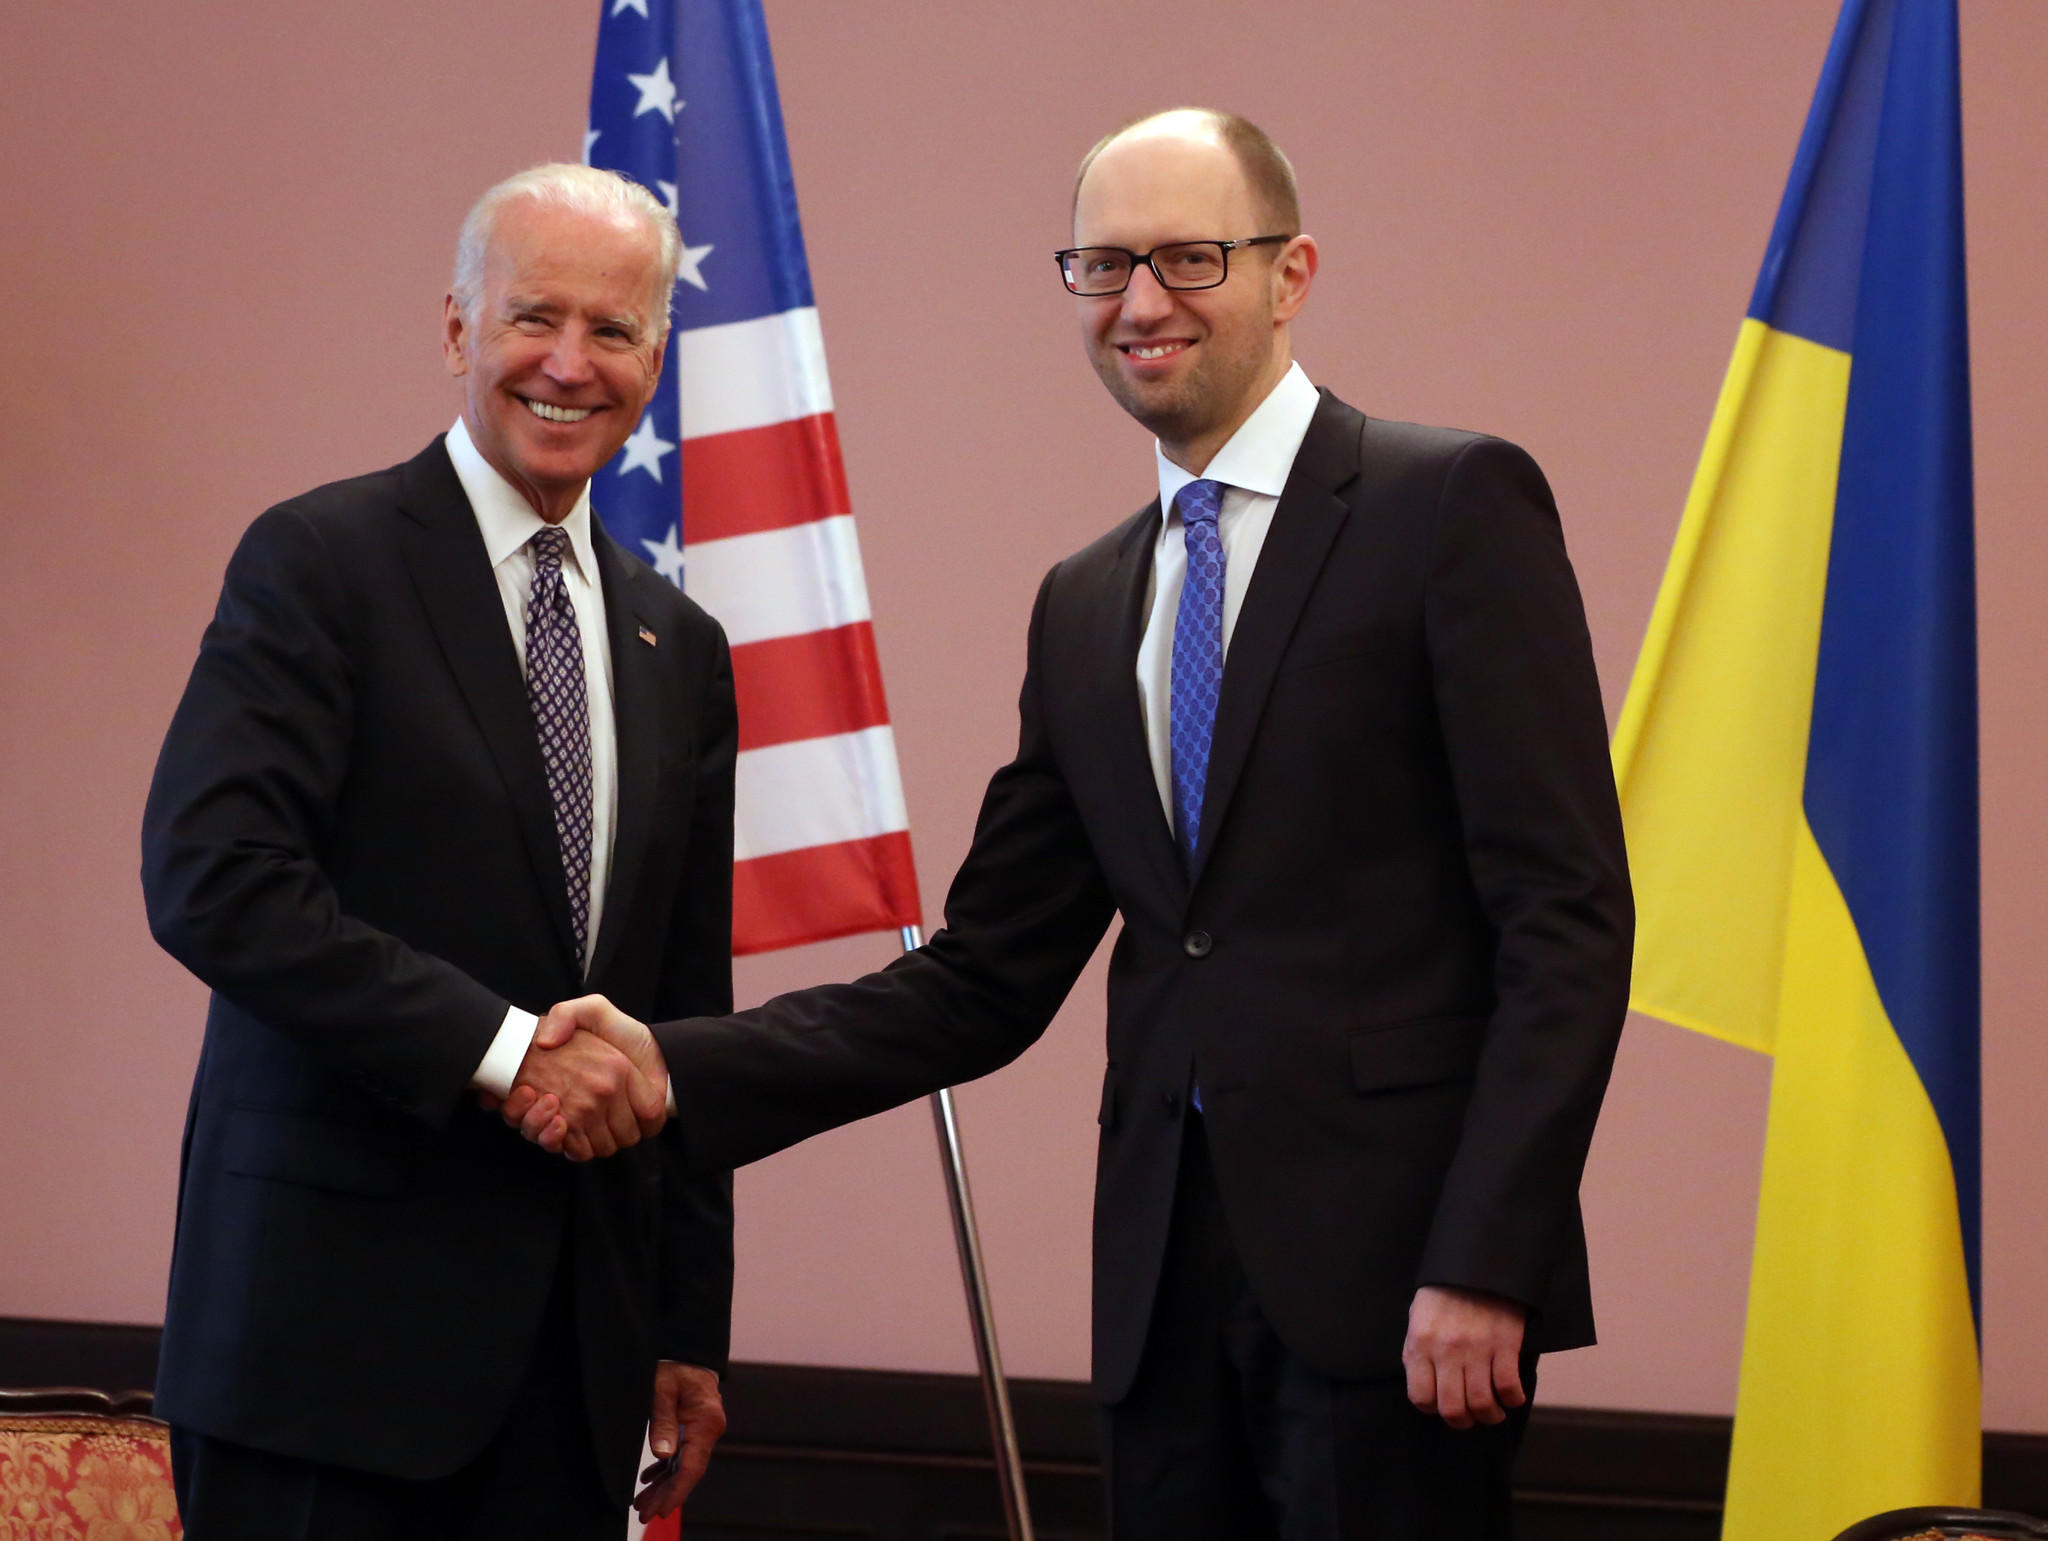 Vice President Joe Biden meets with Ukraine's acting prime minister, Arseny Yatsenyuk, in Kiev on Tuesday.